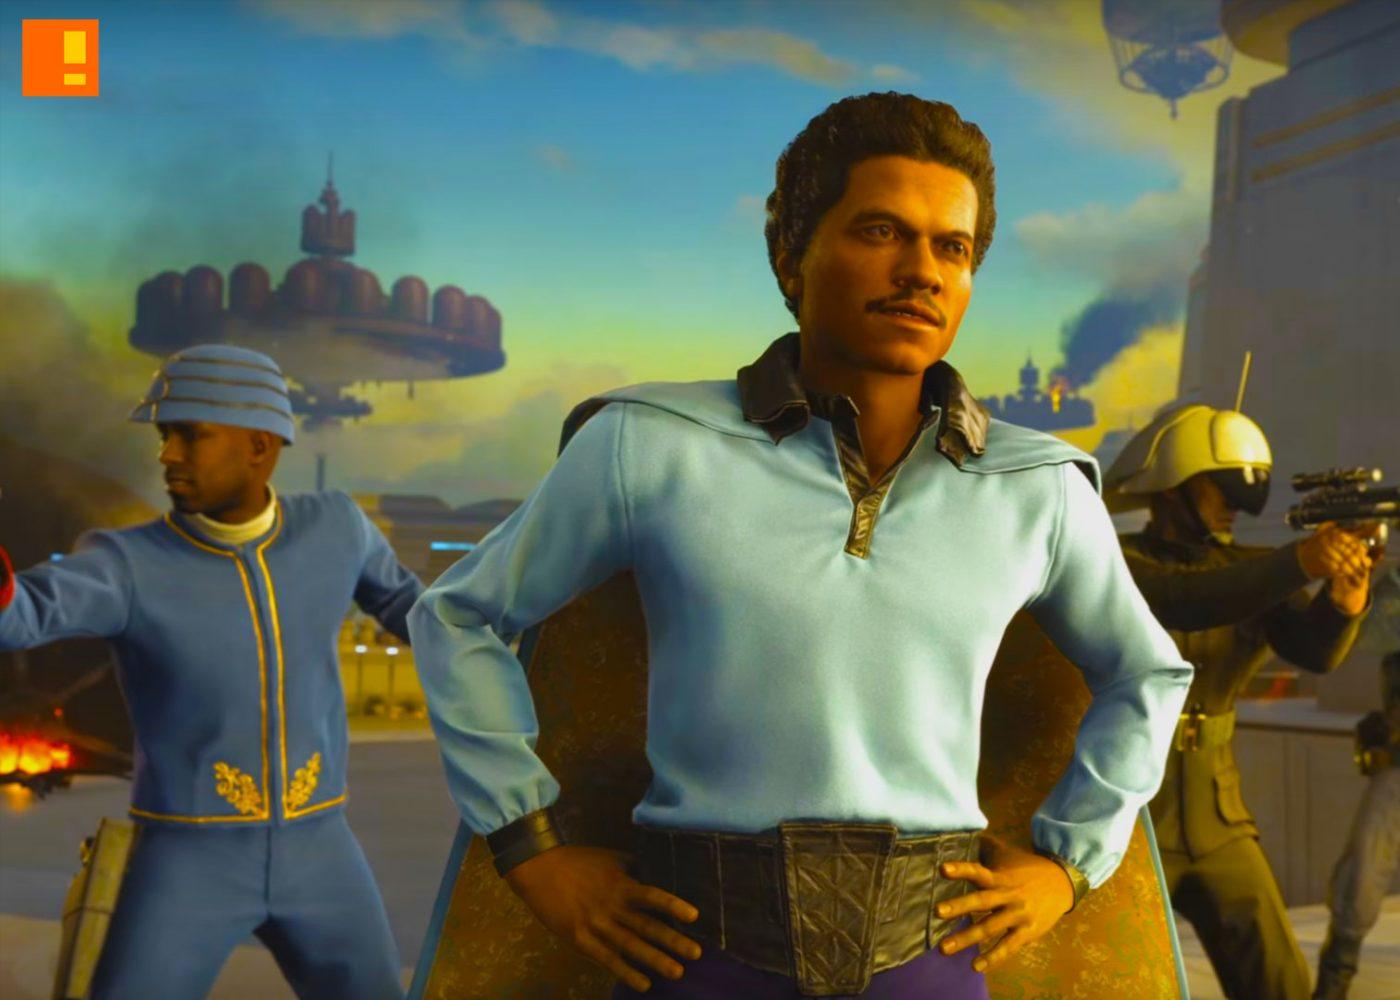 PS4, PC, Xbox One,bespin, ea, star wars, cloud city, cloud city of bespin, lando , ee-4 blasters, X-8 Night Sniper, electronic arts, Lando Calrissian, Dengar, dlc, expansion, dice games,